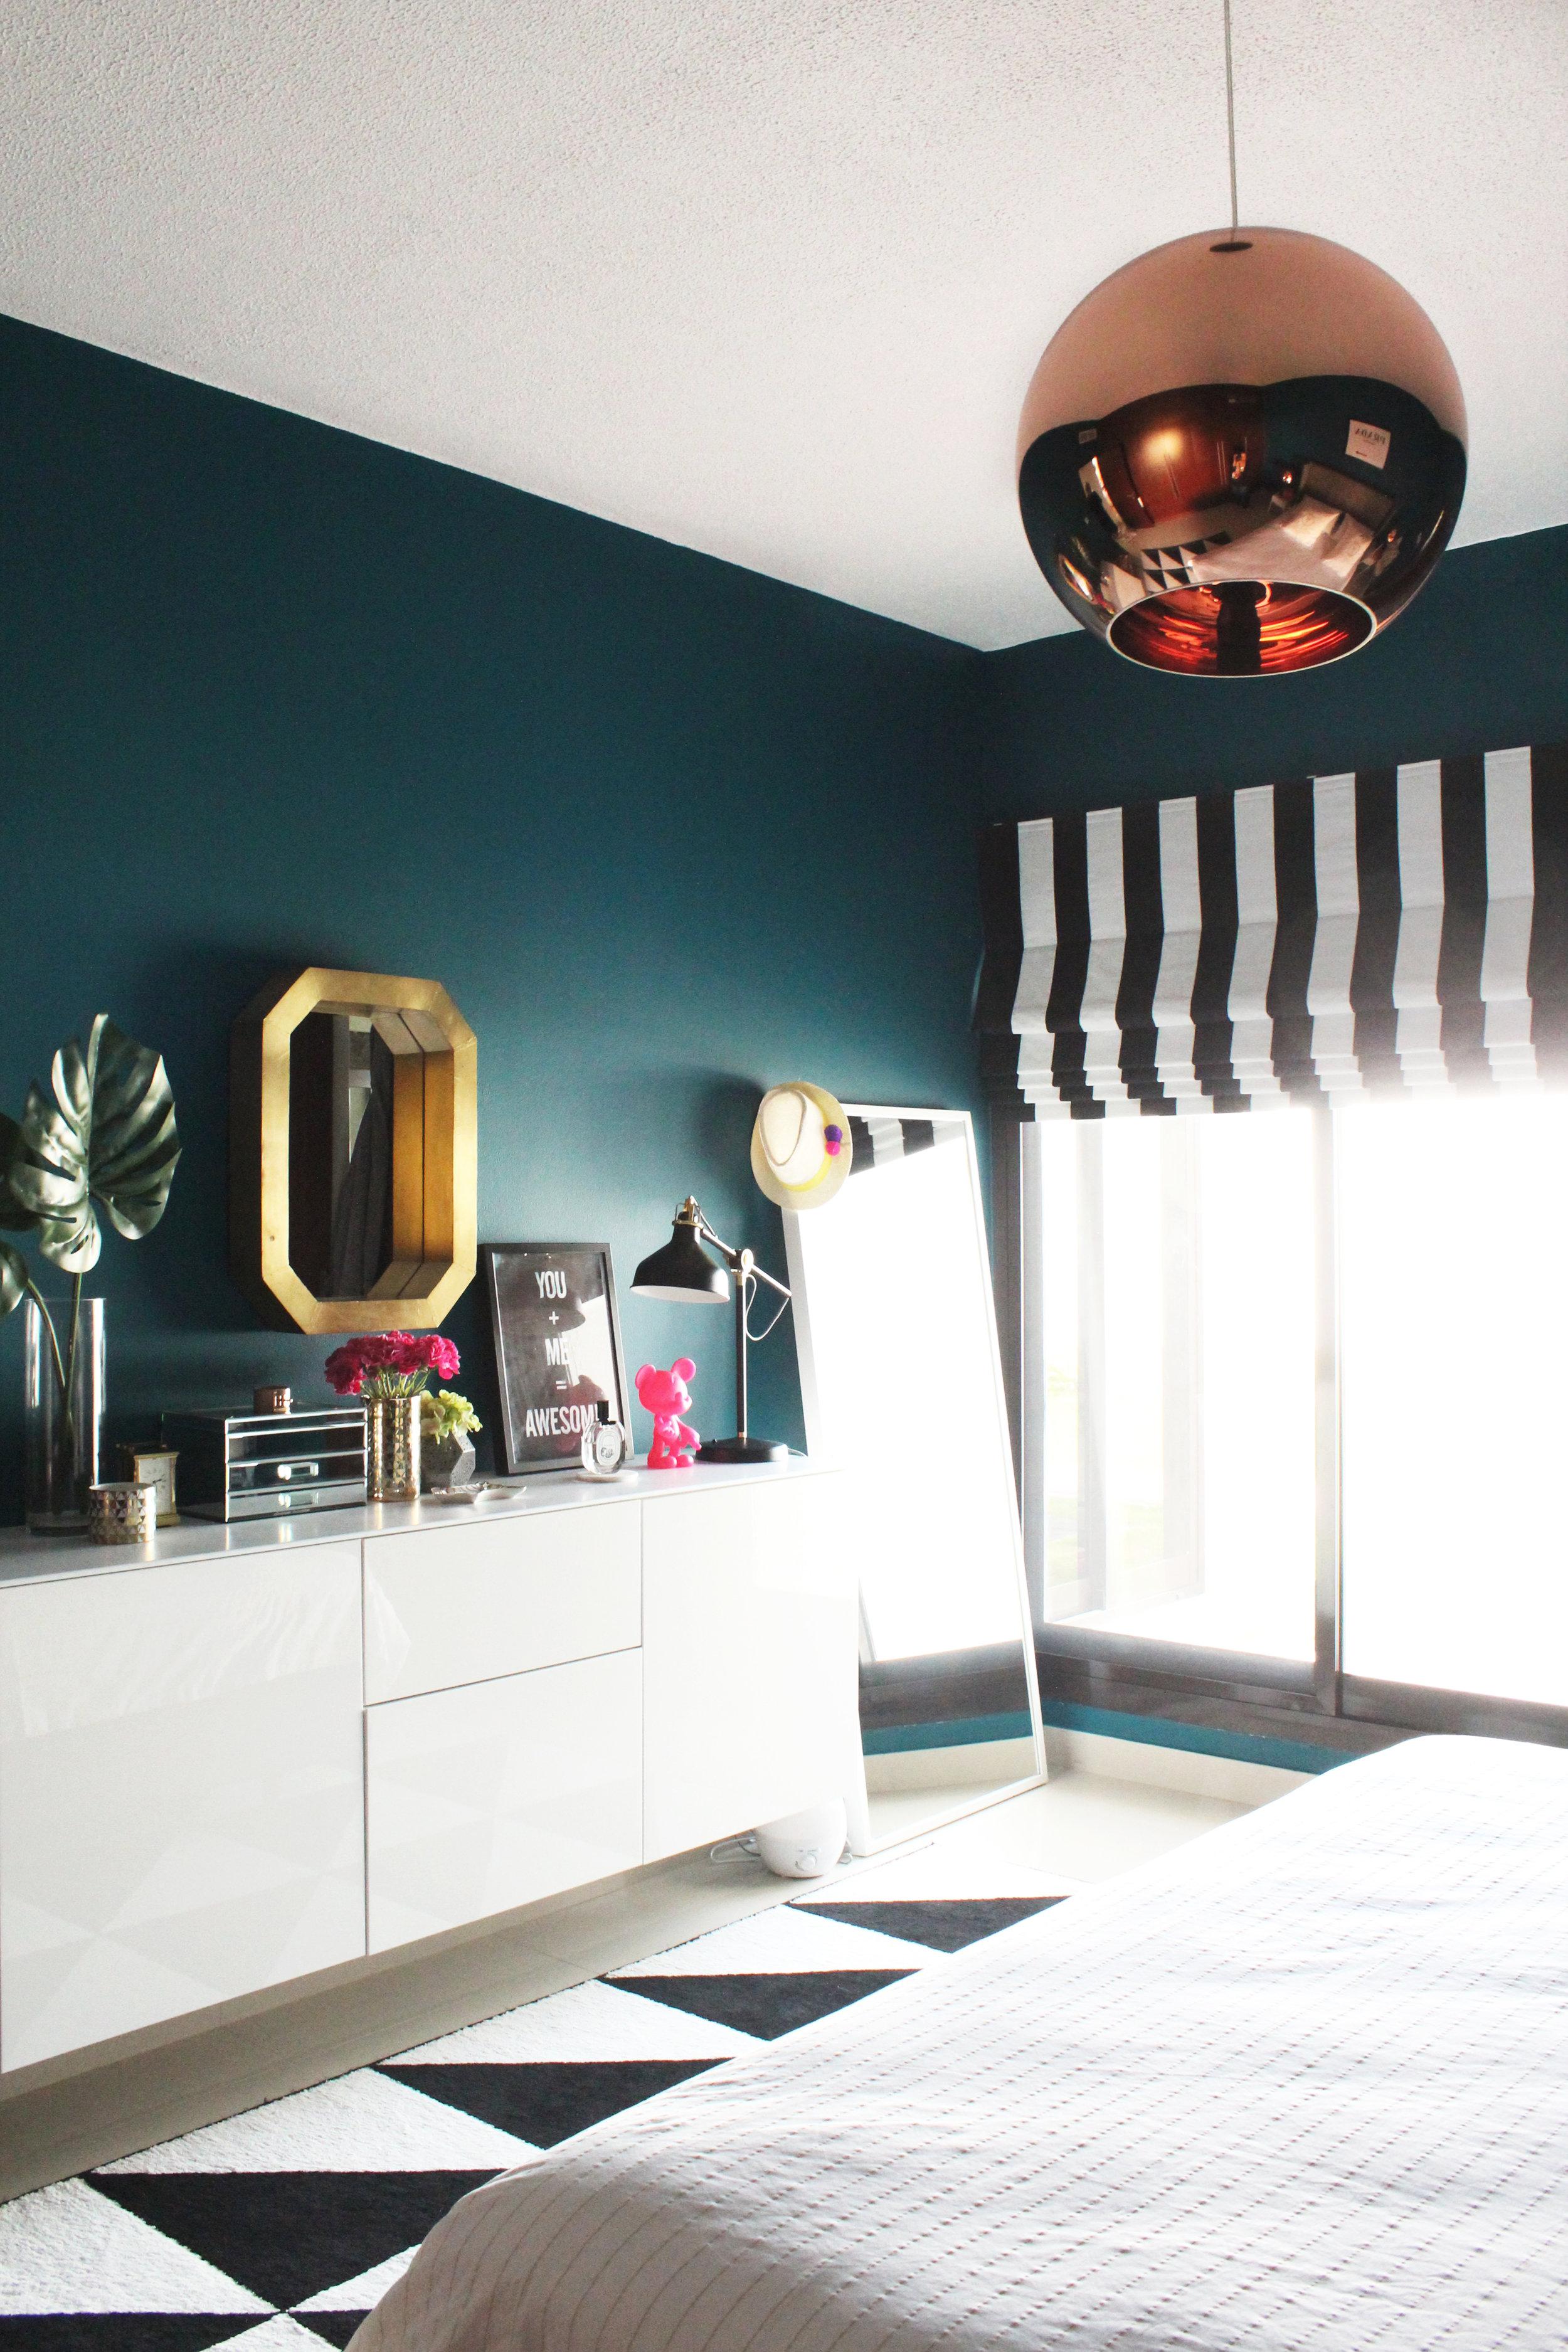 emilies bedroom - 59 of 60.jpg